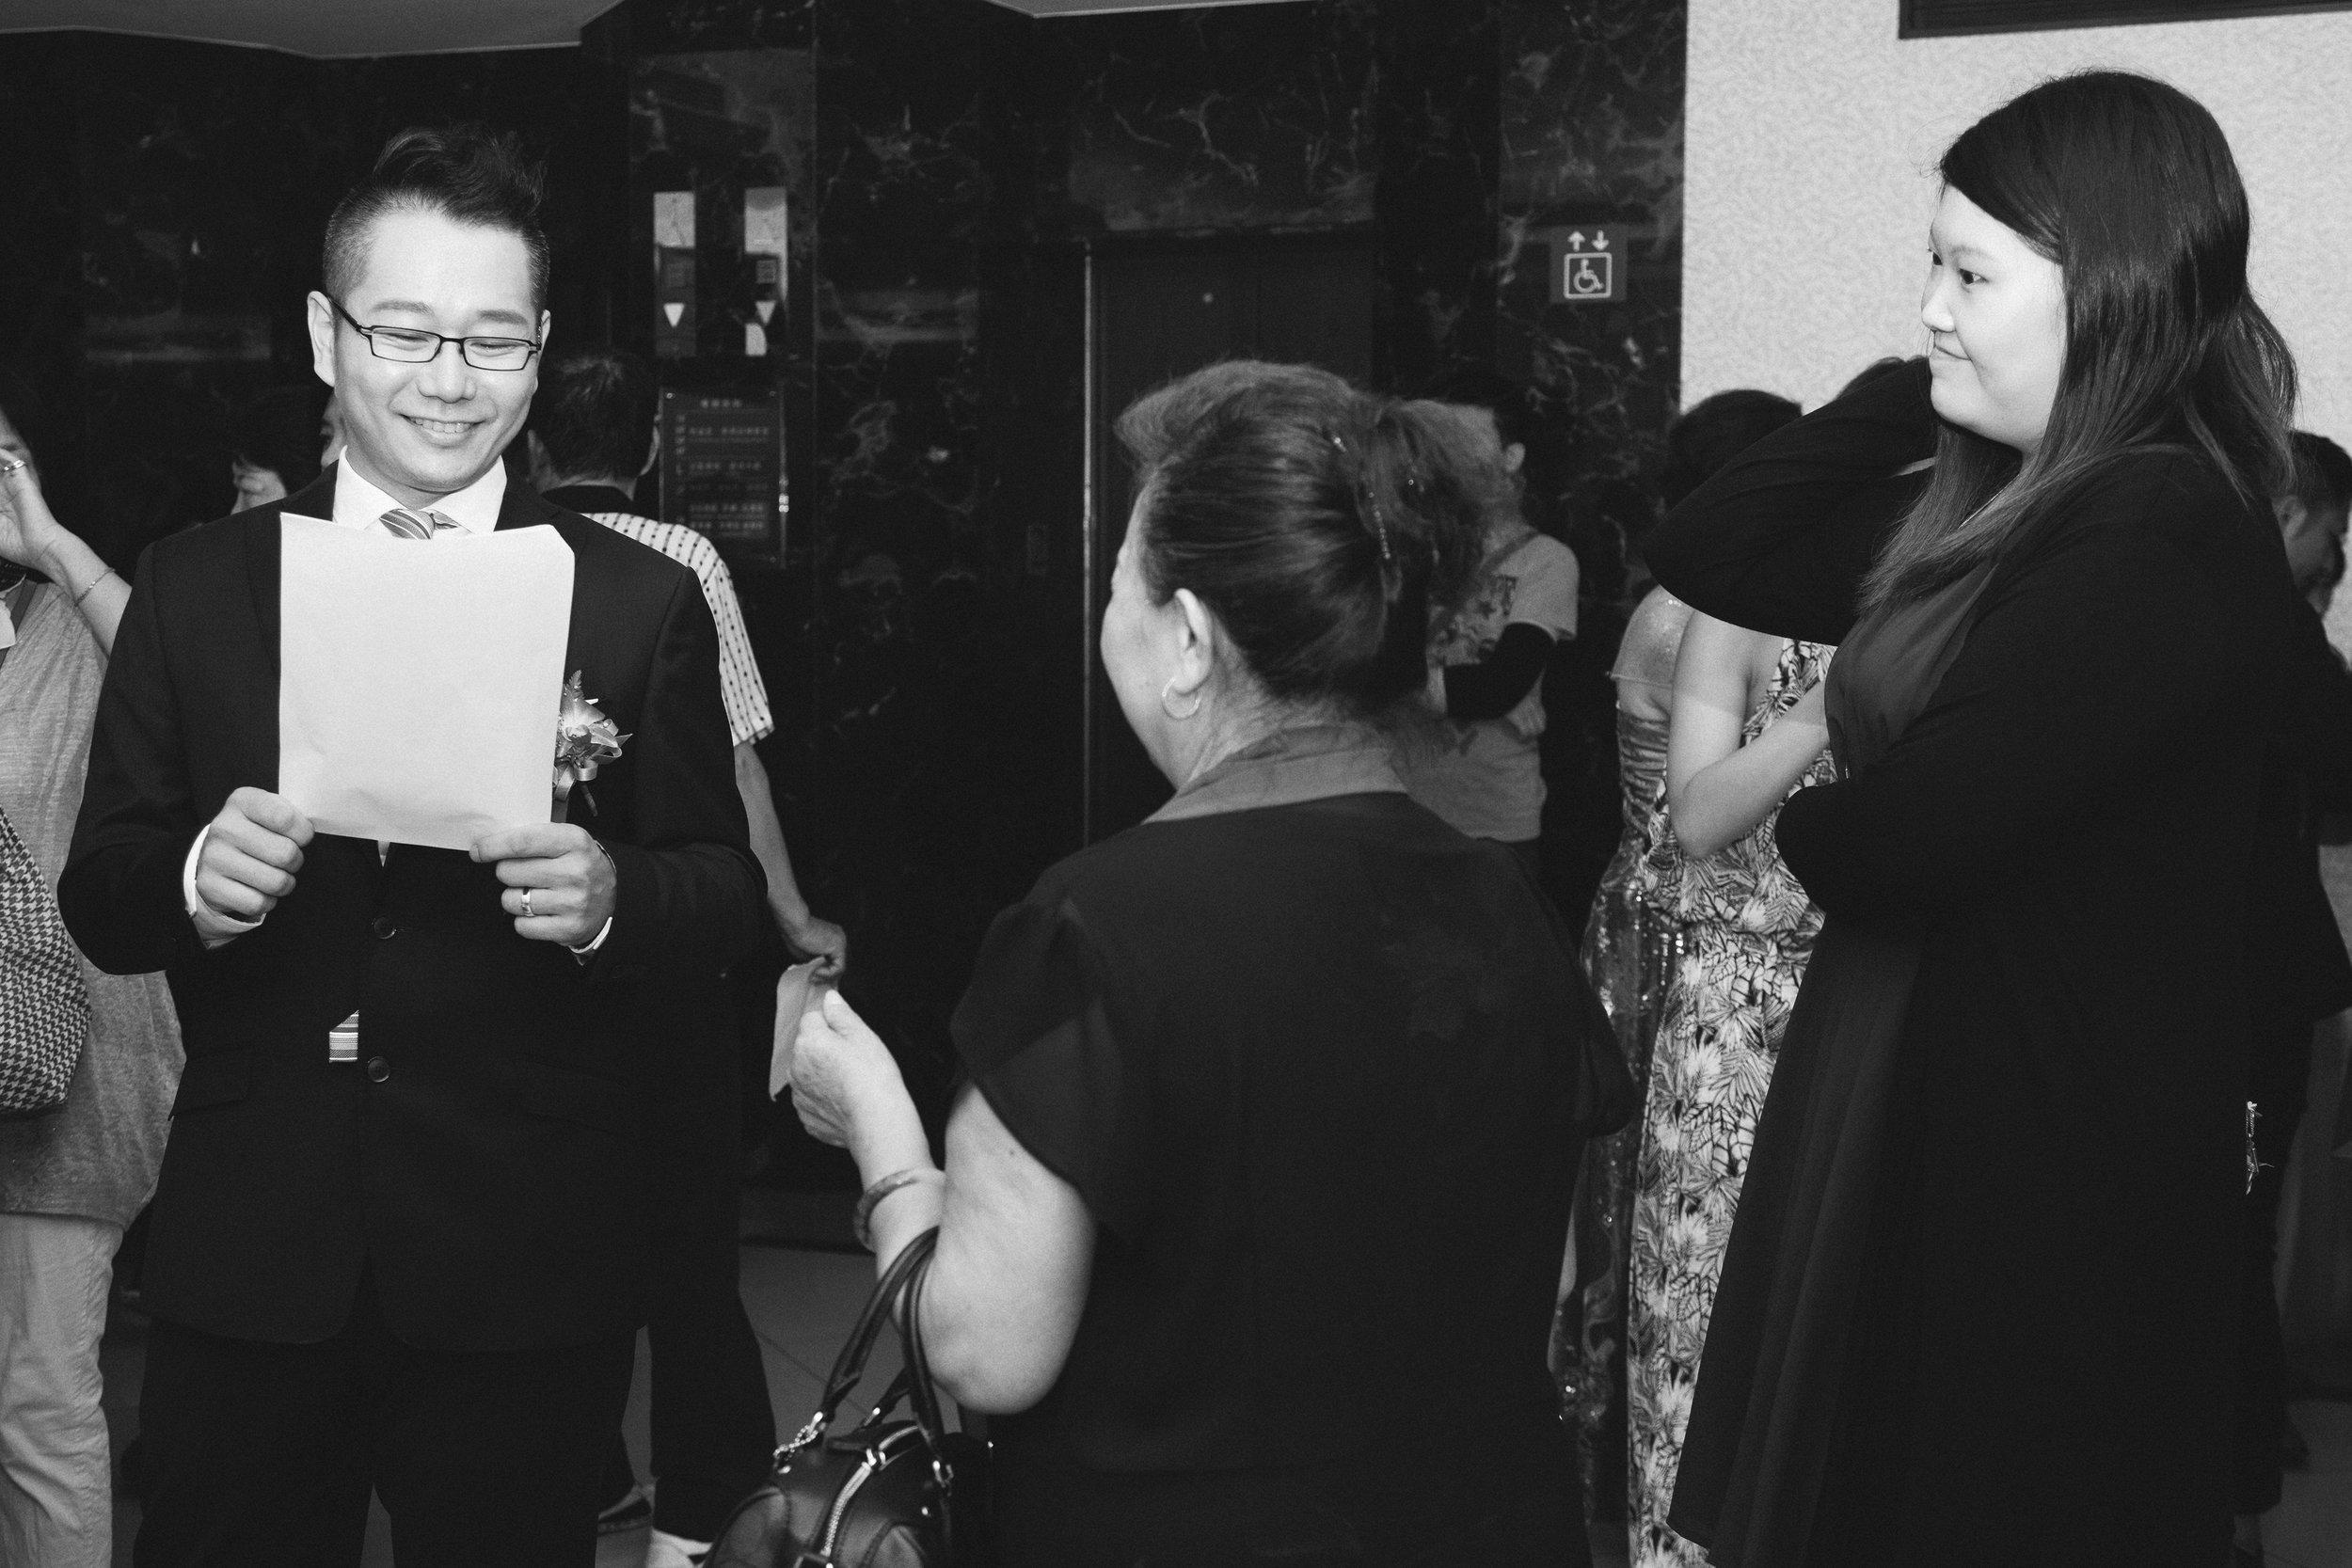 [JC]CREATIVE 女性攝影師 北投儷宴會館 補請台灣WEDDING    自然風格 台北婚攝推 女婚攝  桃園婚攝   圖像00078.JPG